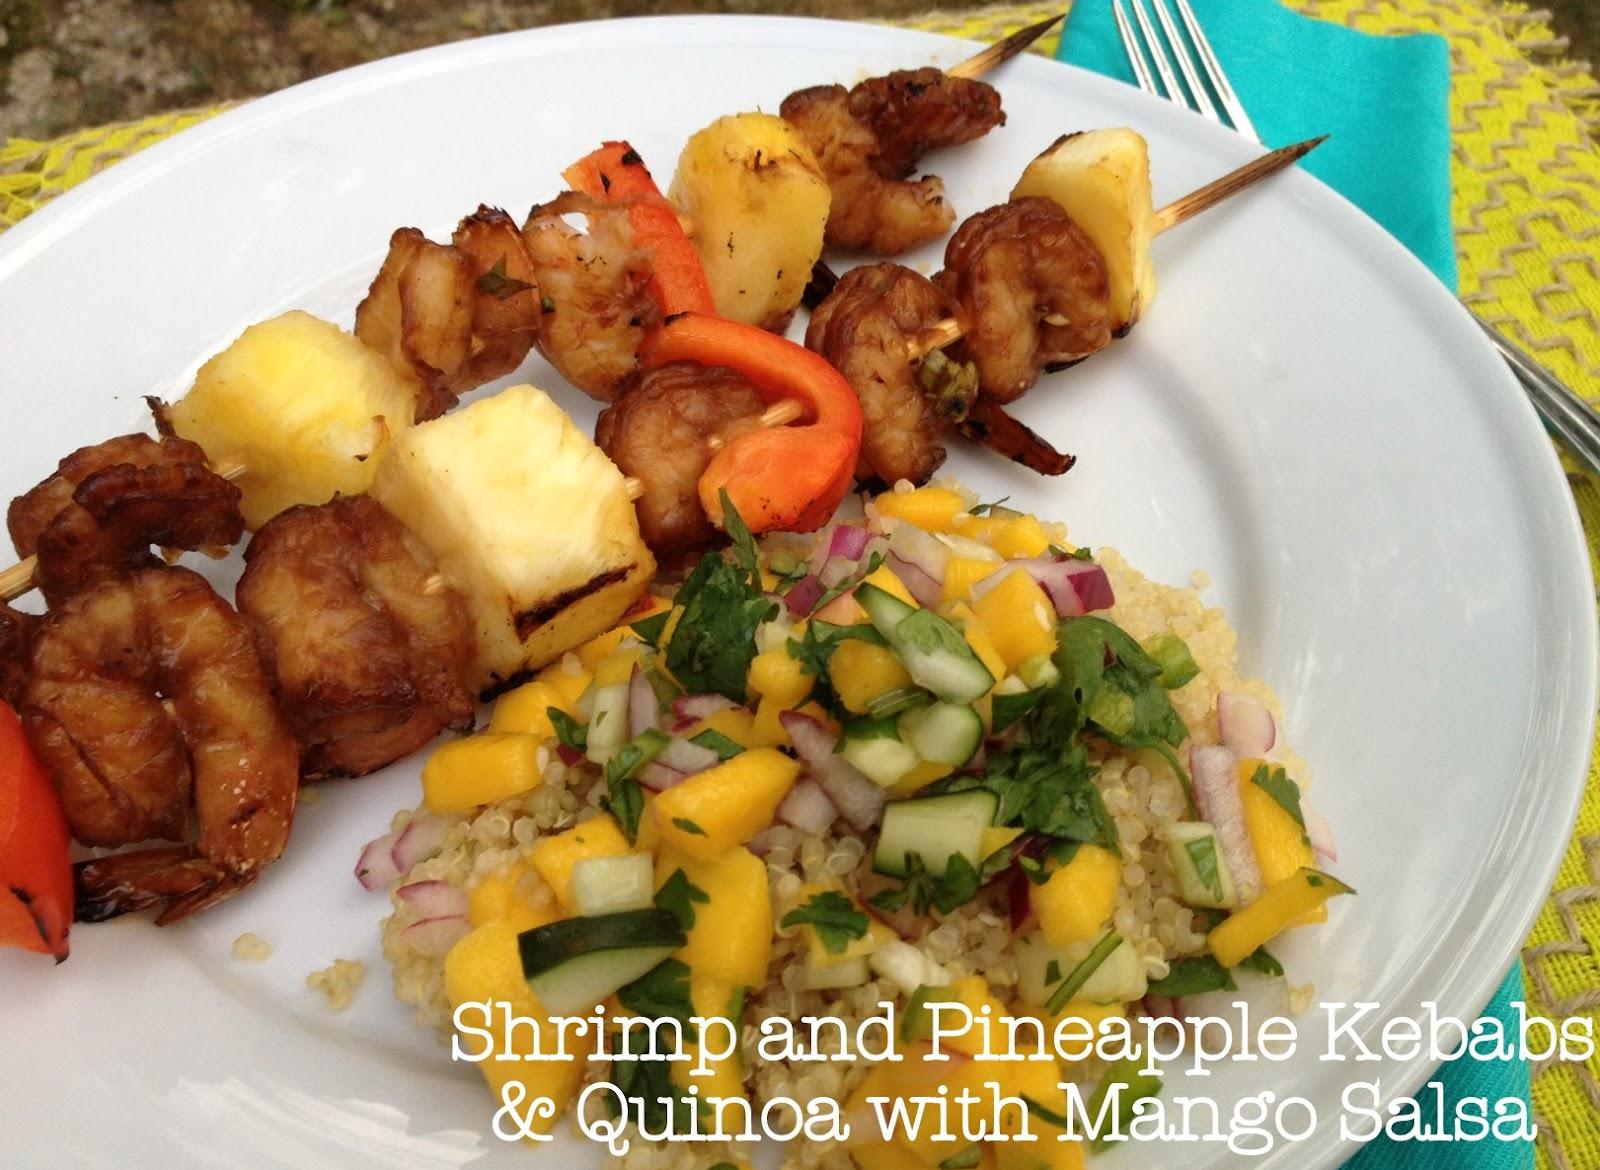 sadie + stella: Shrimp and Pineapple Kebabs & Quinoa with Mango Salsa